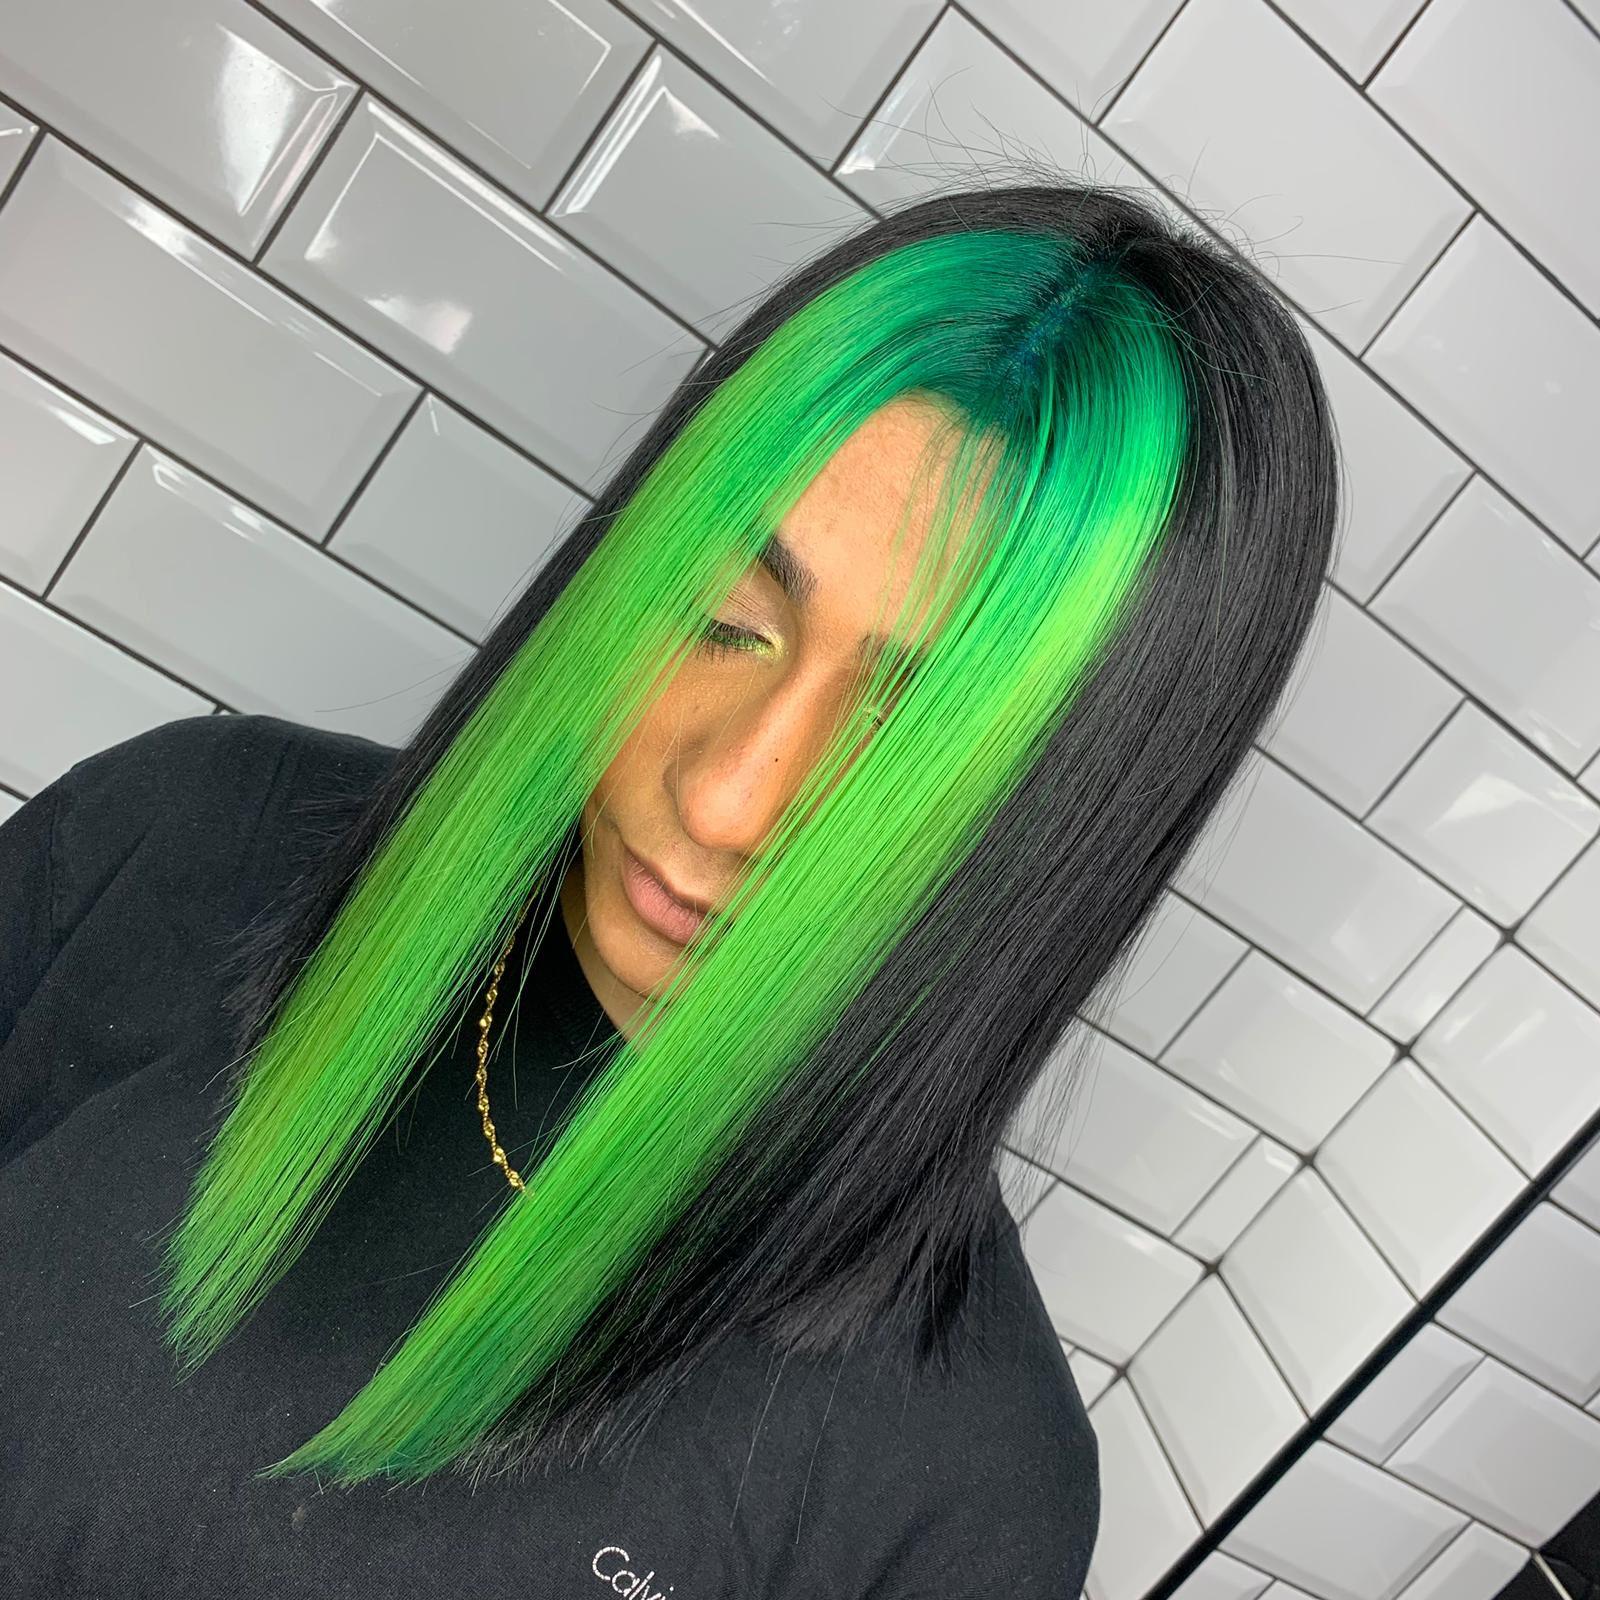 Pin By Aaliyah Rivera On Colour Craze Hair Styles Dyed Hair Hair Streaks